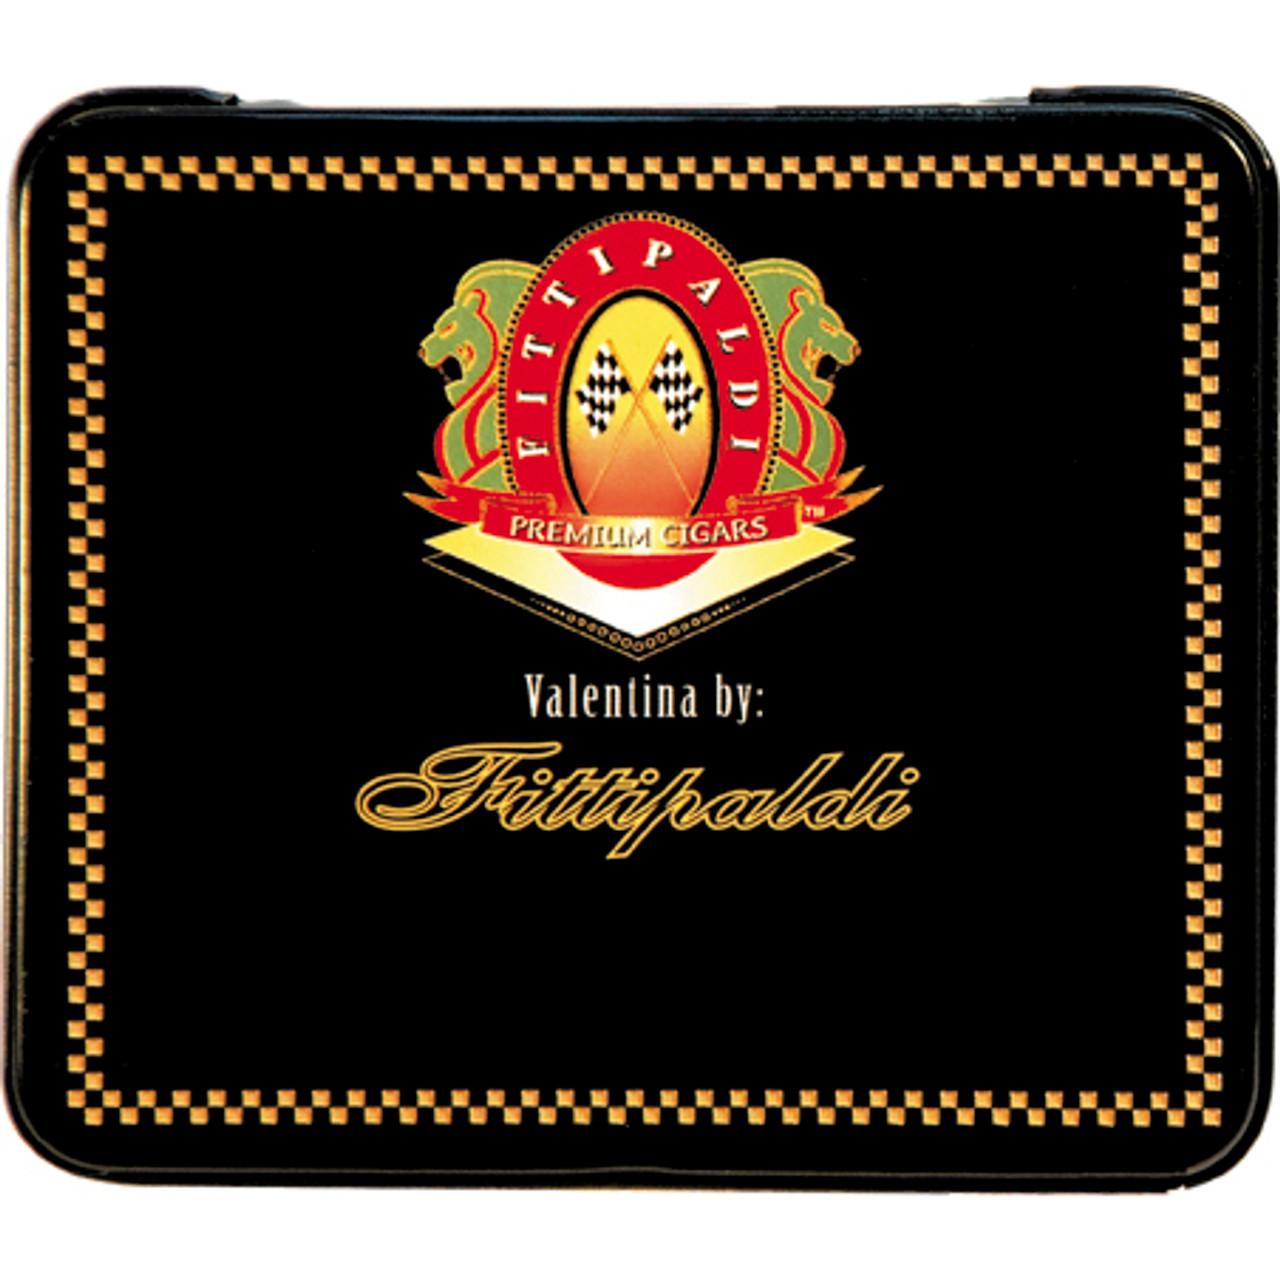 Fittipaldi Valentina Vanilla Cigars - 3 3/8 x 22 (5 Tins of 13)